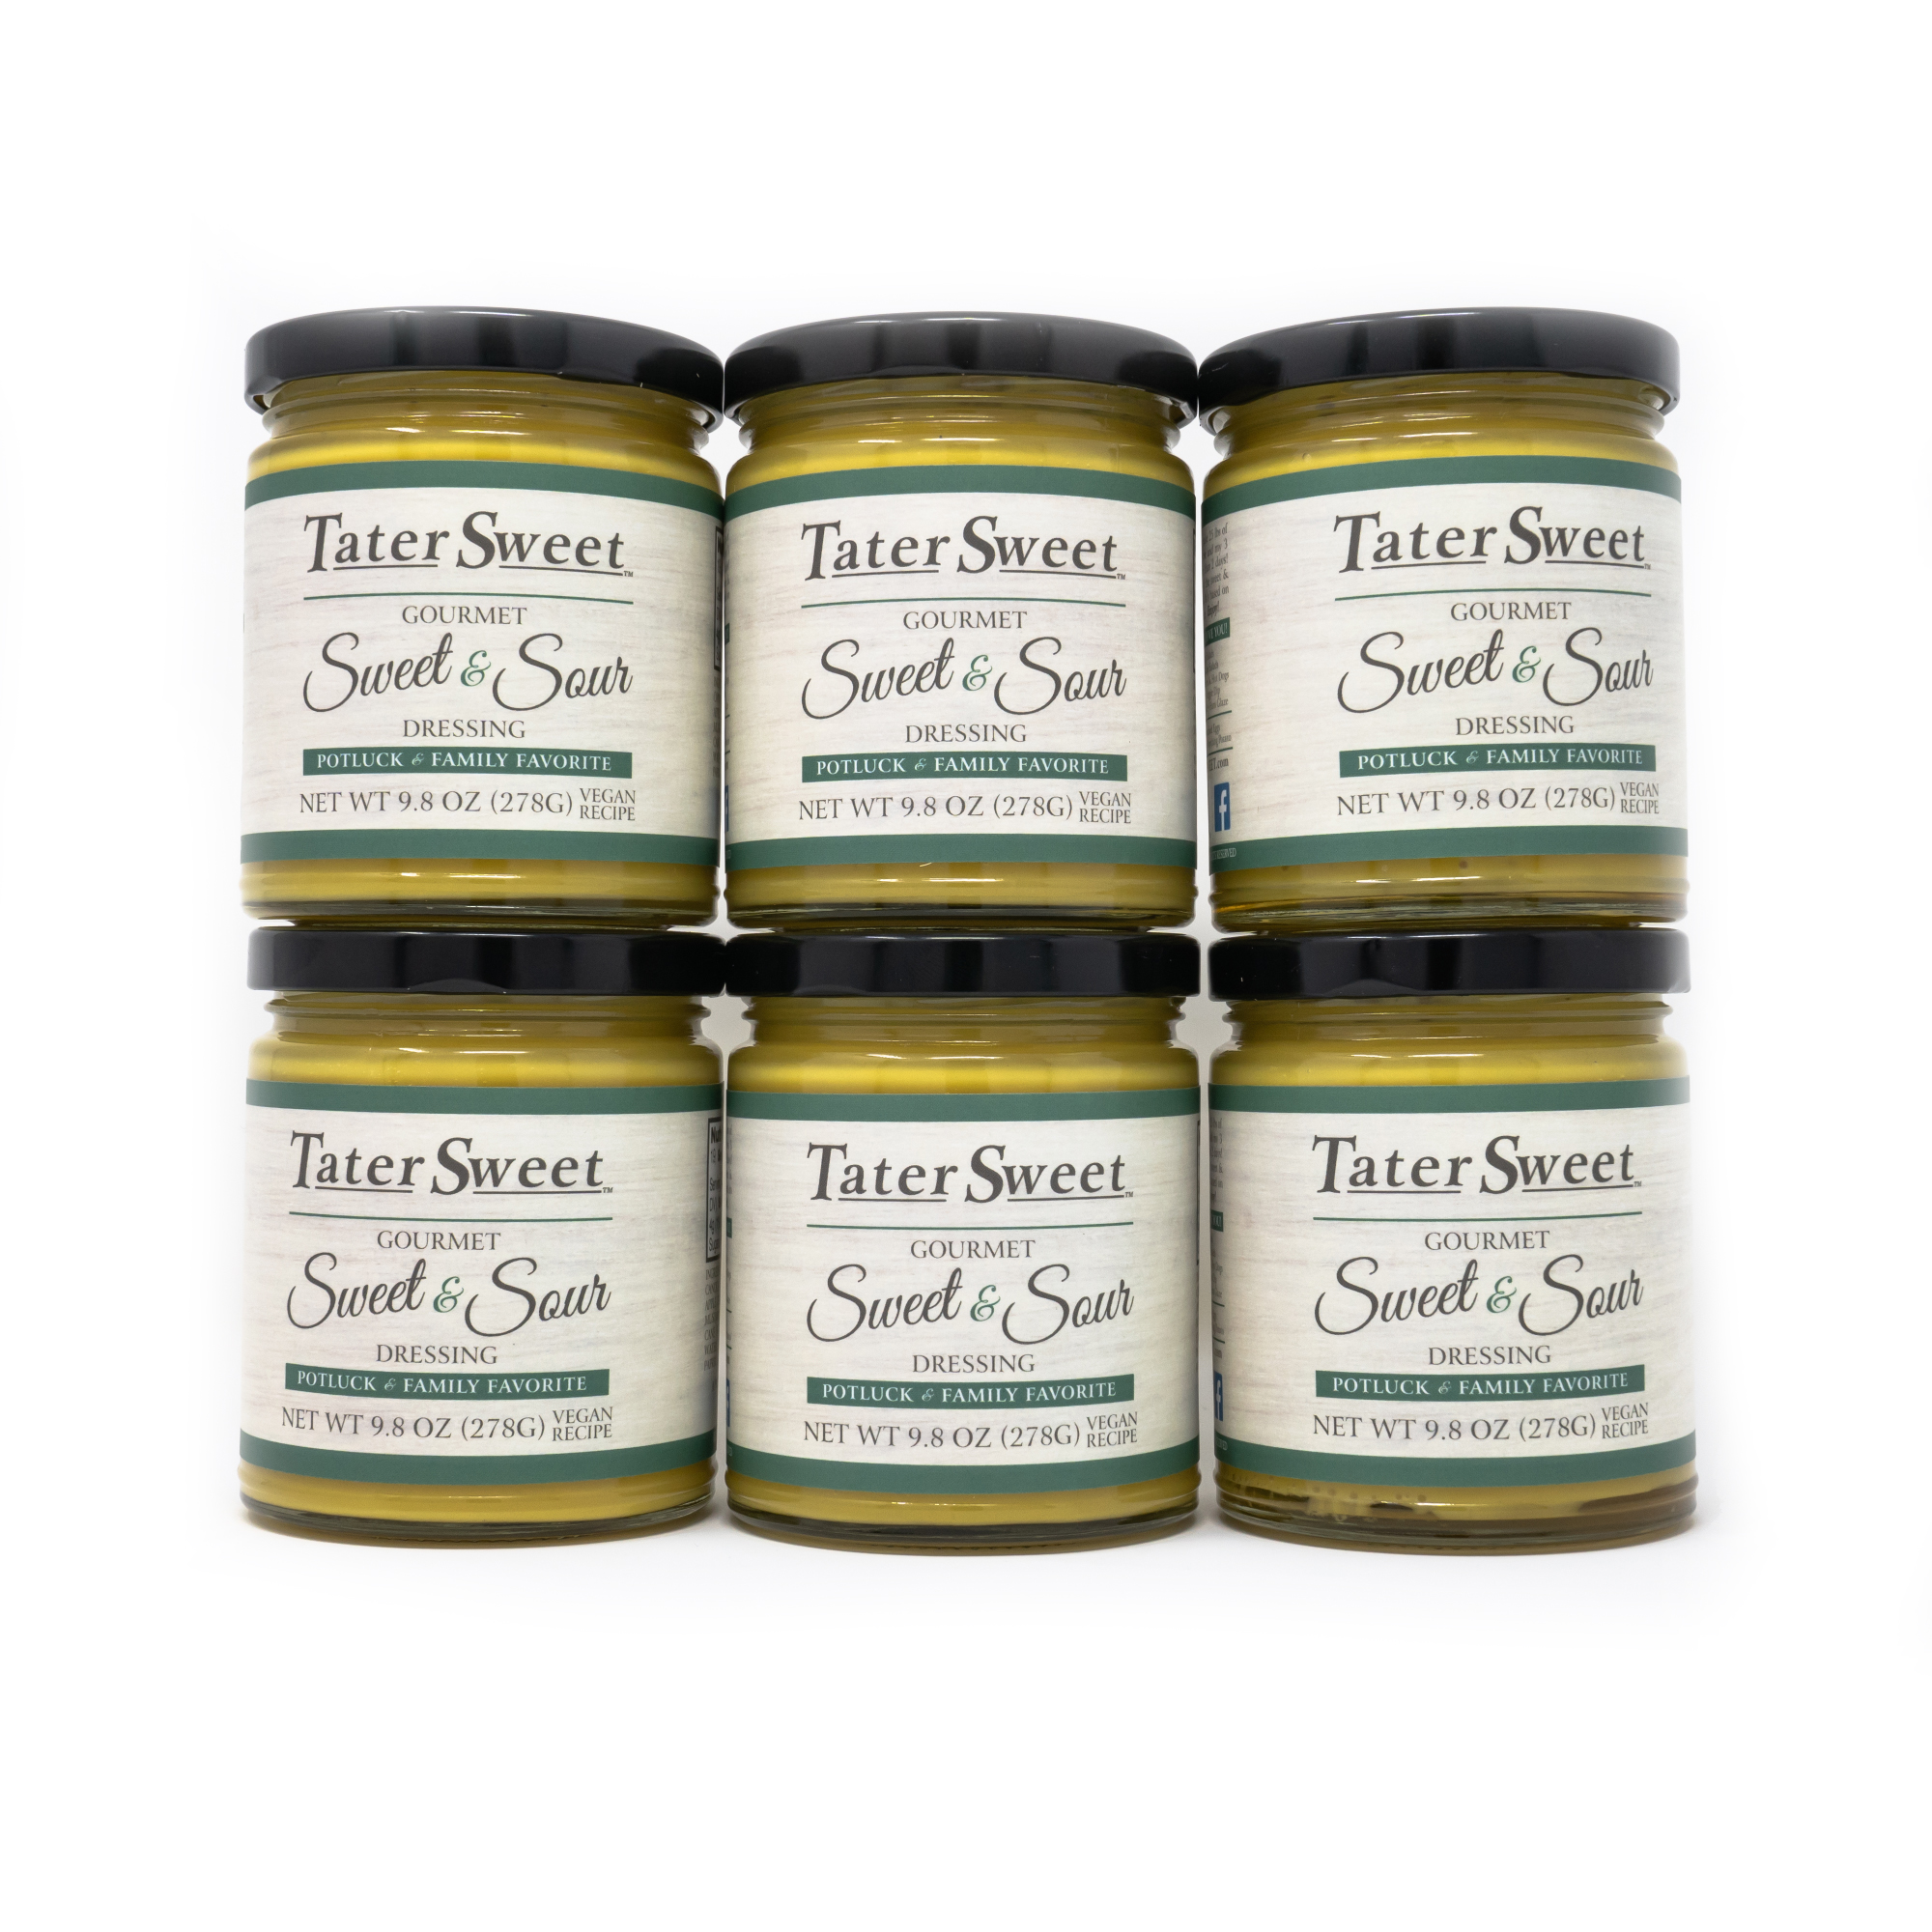 6 glass jars filled with TaterSweet Gourmet Dressing - Vegan